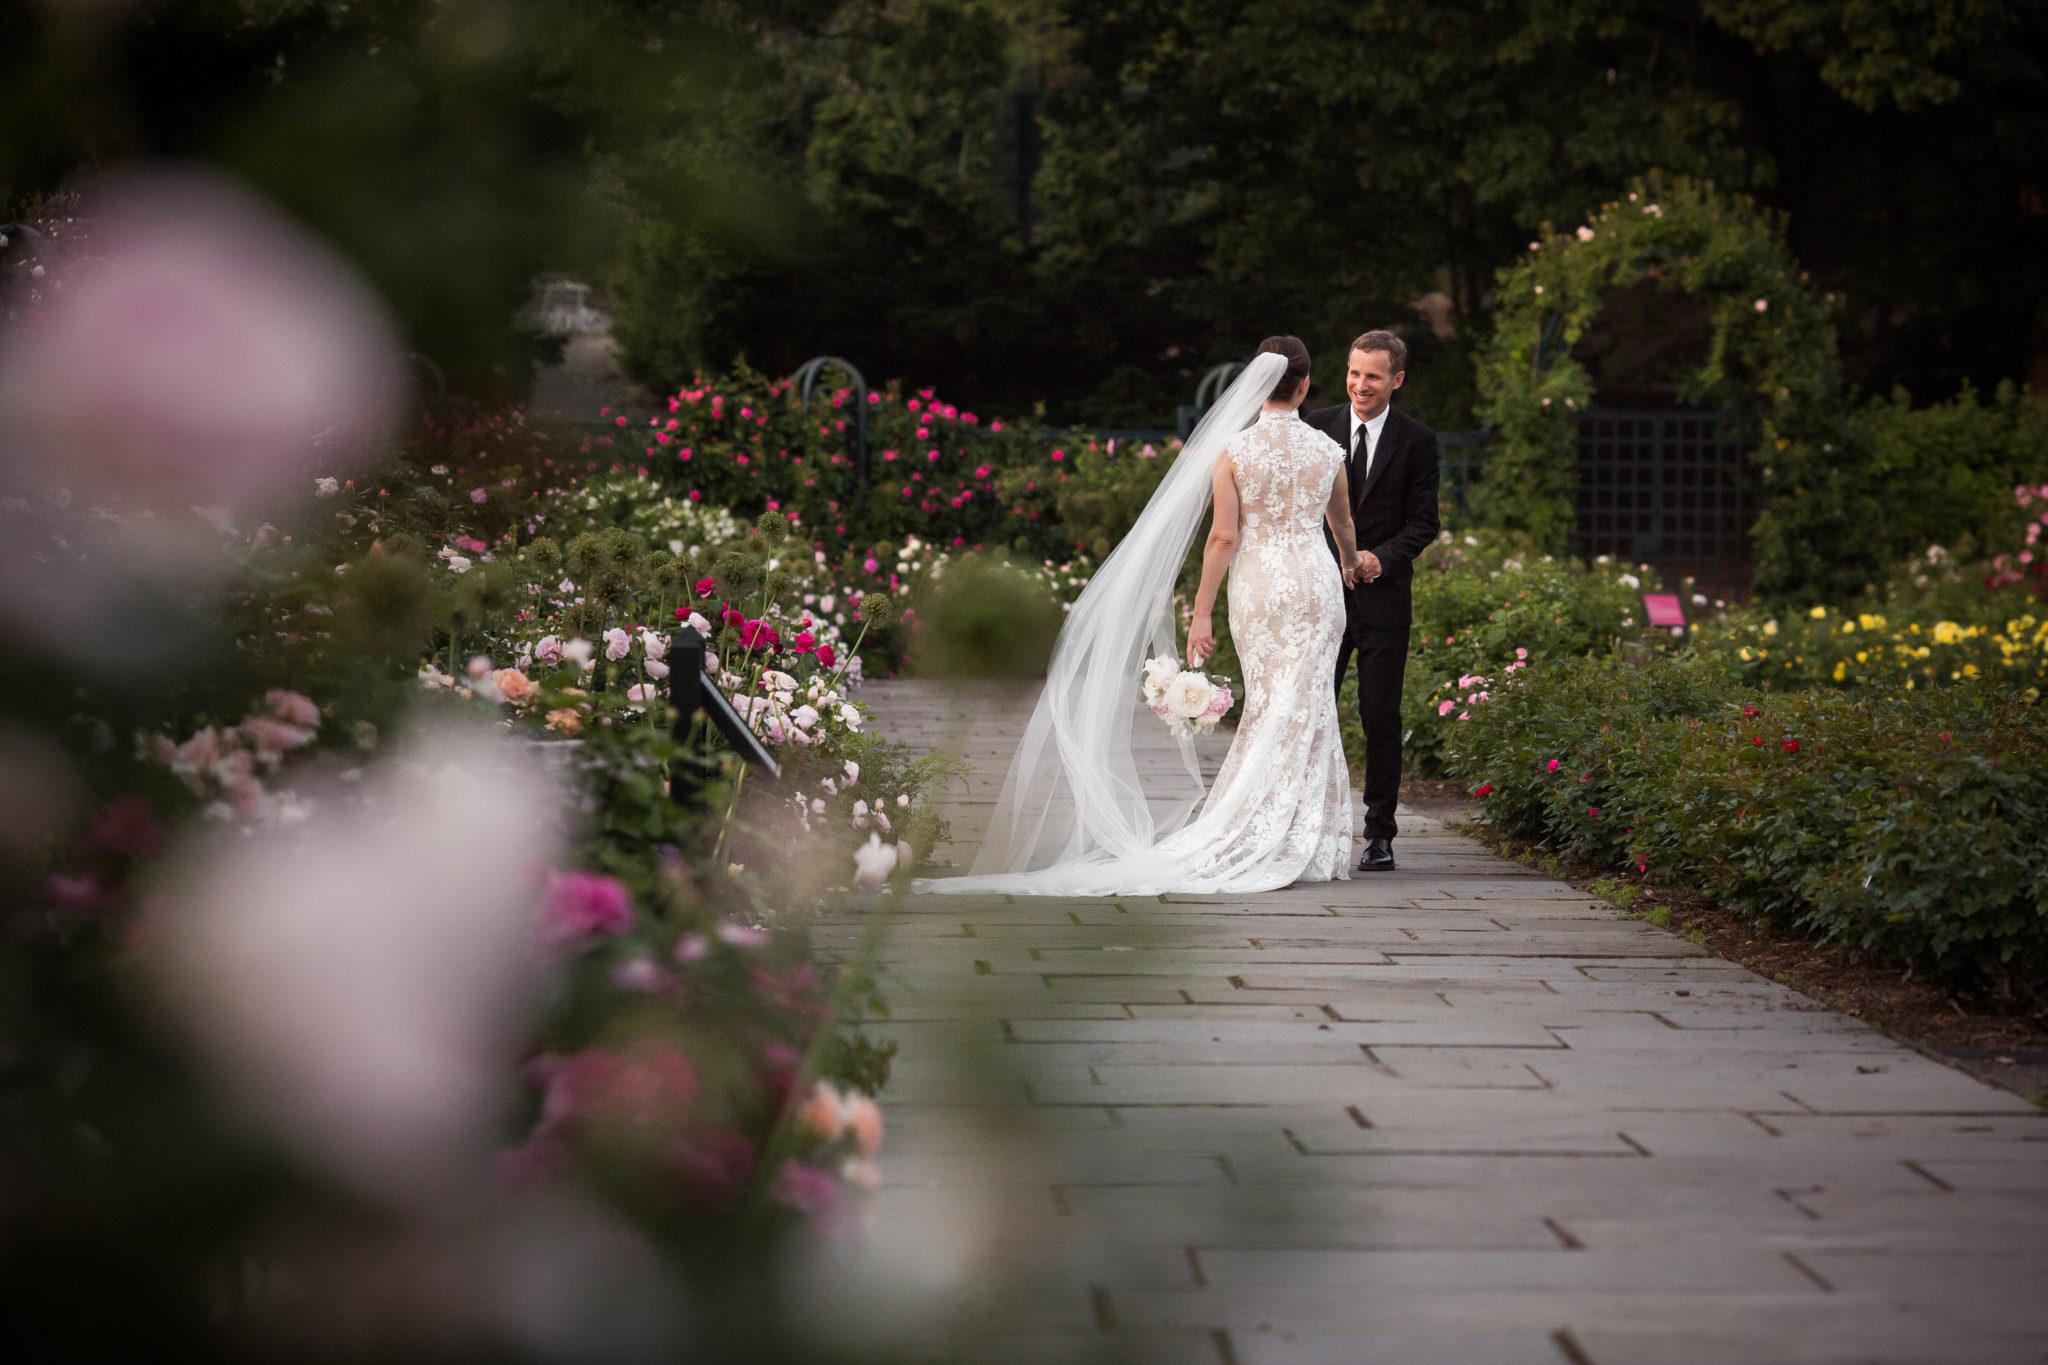 New York Botanical Garden Wedding.Stone Mill Wedding Photography At The Nybg Lili Maciei S